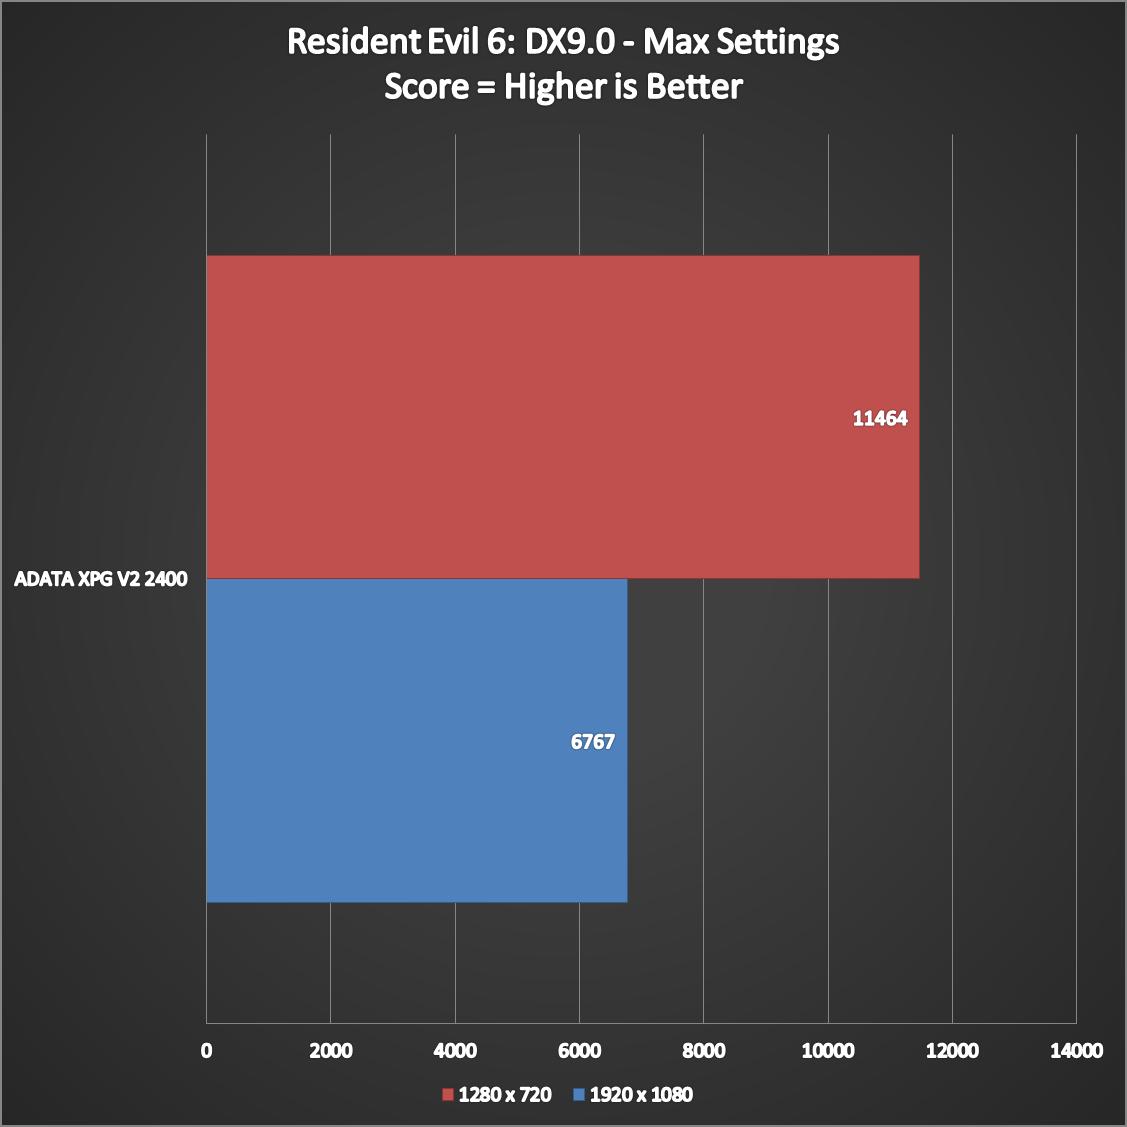 ADATA-XPG-V2-2400-Performance-5